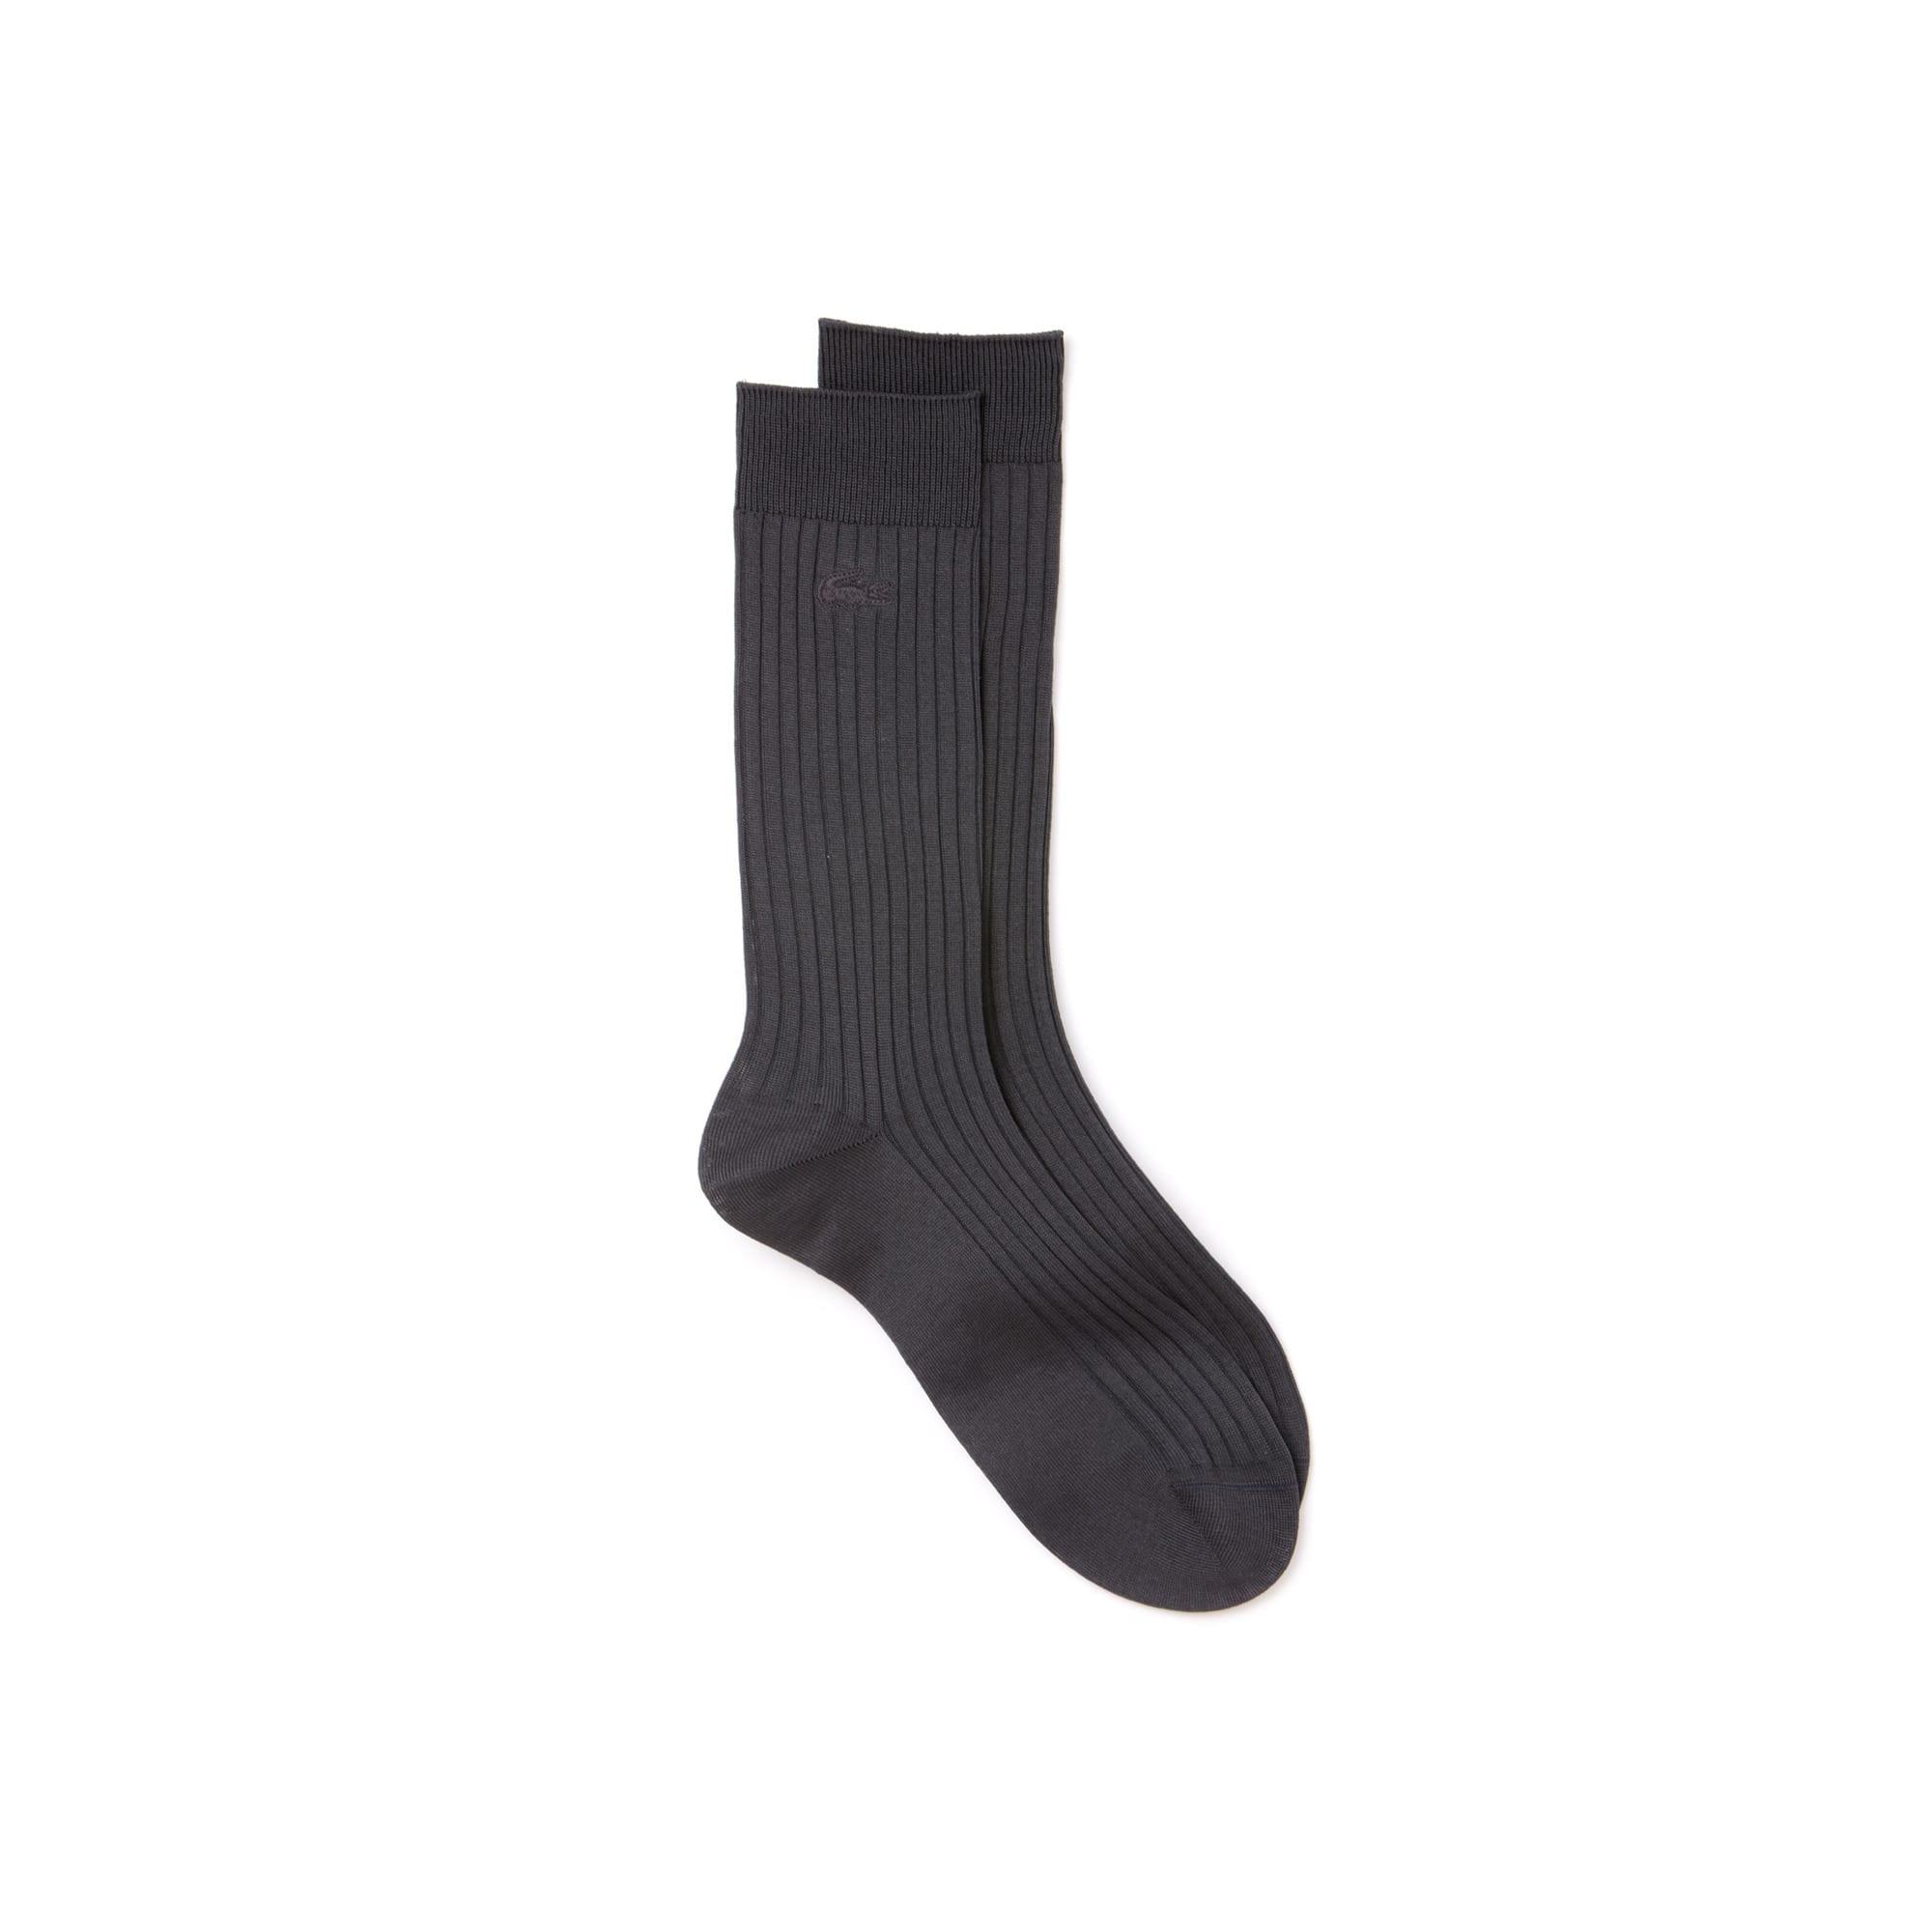 Men's Ribbed solid socks in mercerized cotton blend